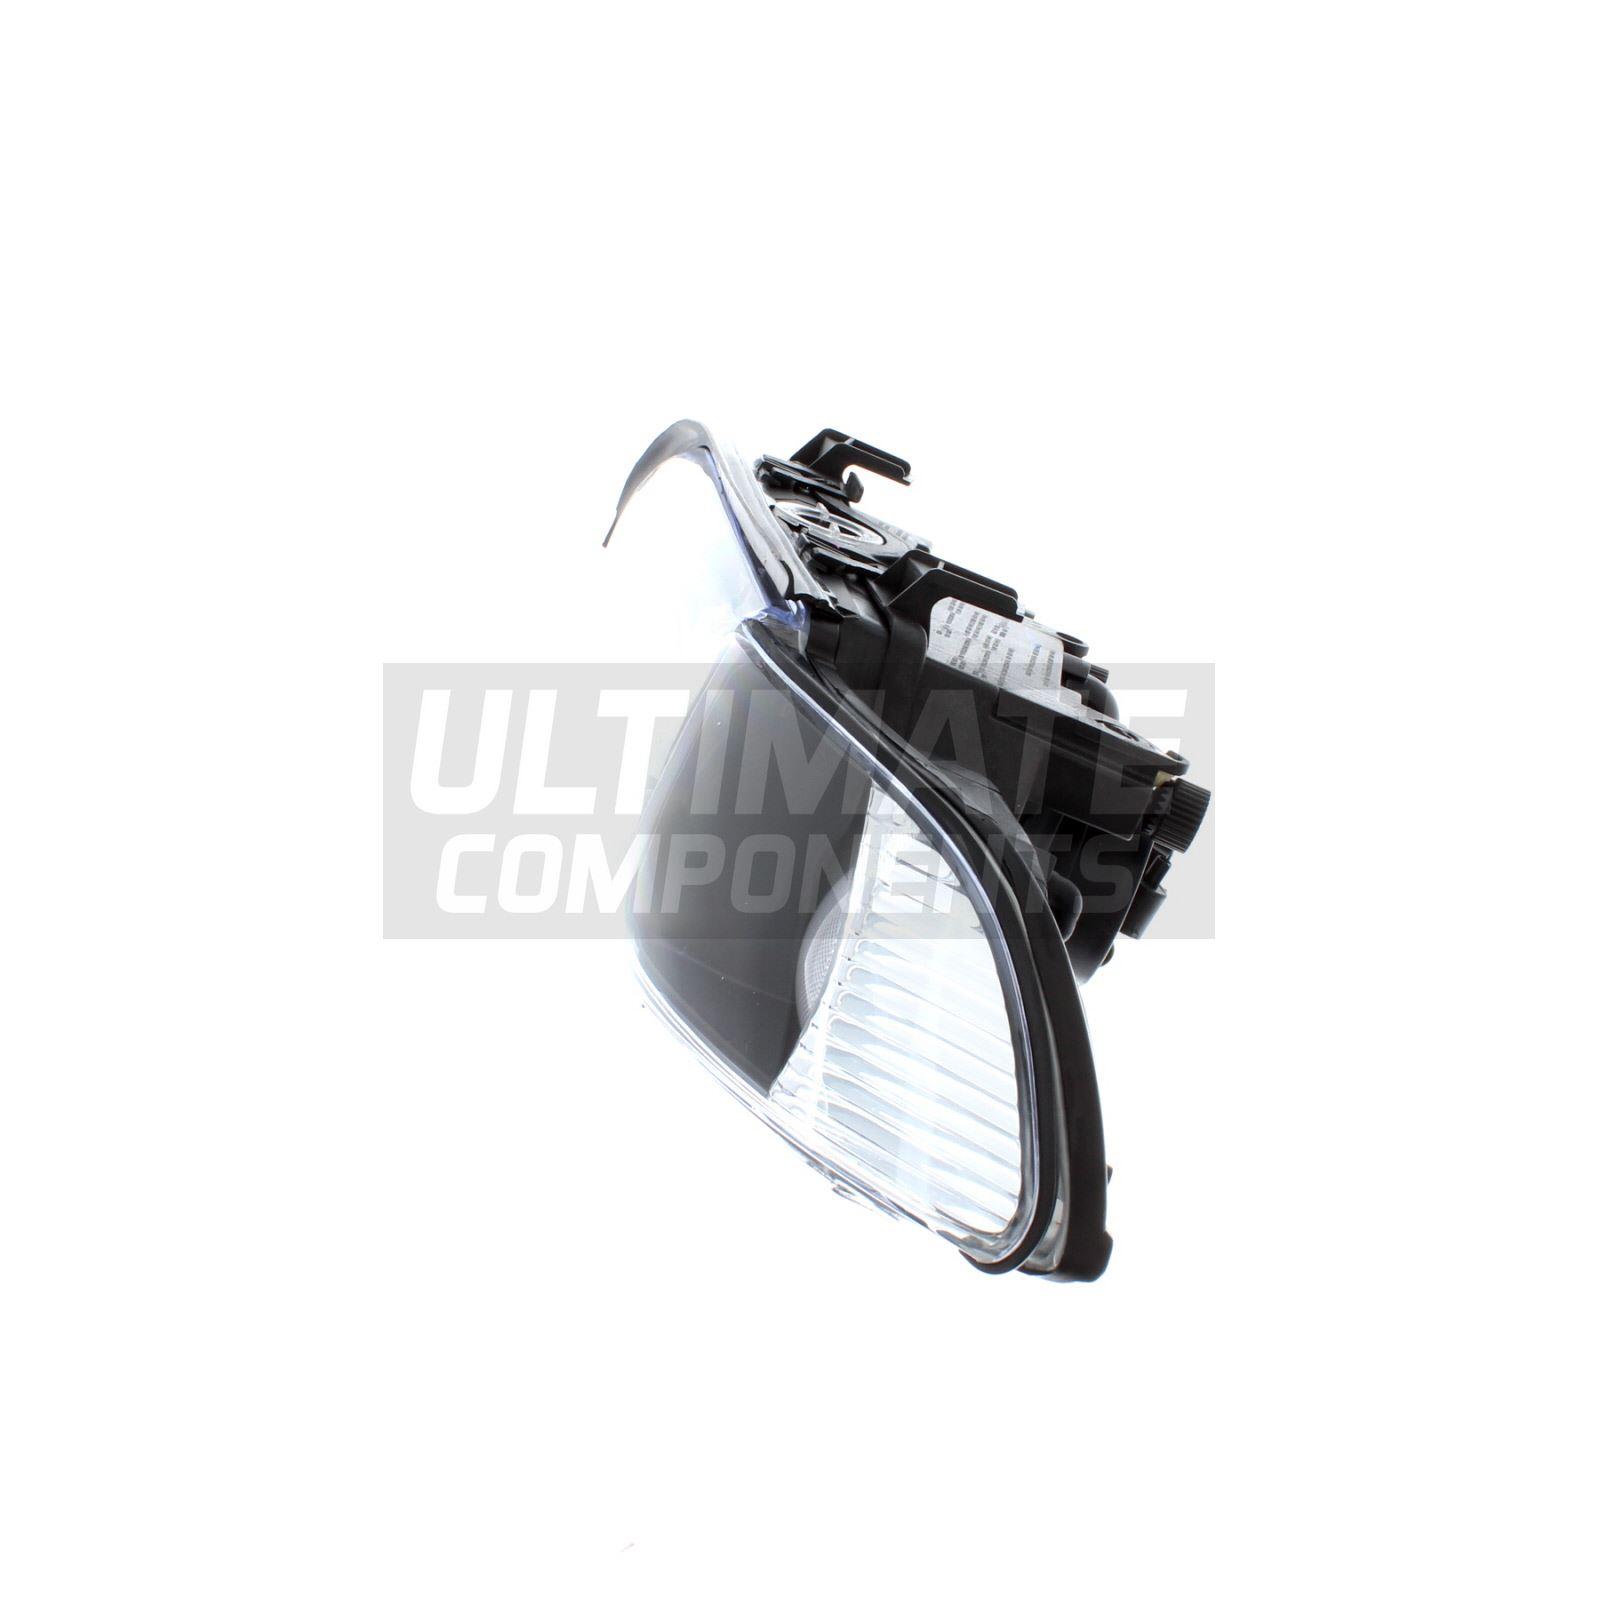 For BMW 3 Series E91 Touring 05-12 Side//Lo//Hi 501 H7 H7 Xenon Headlight Bulbs